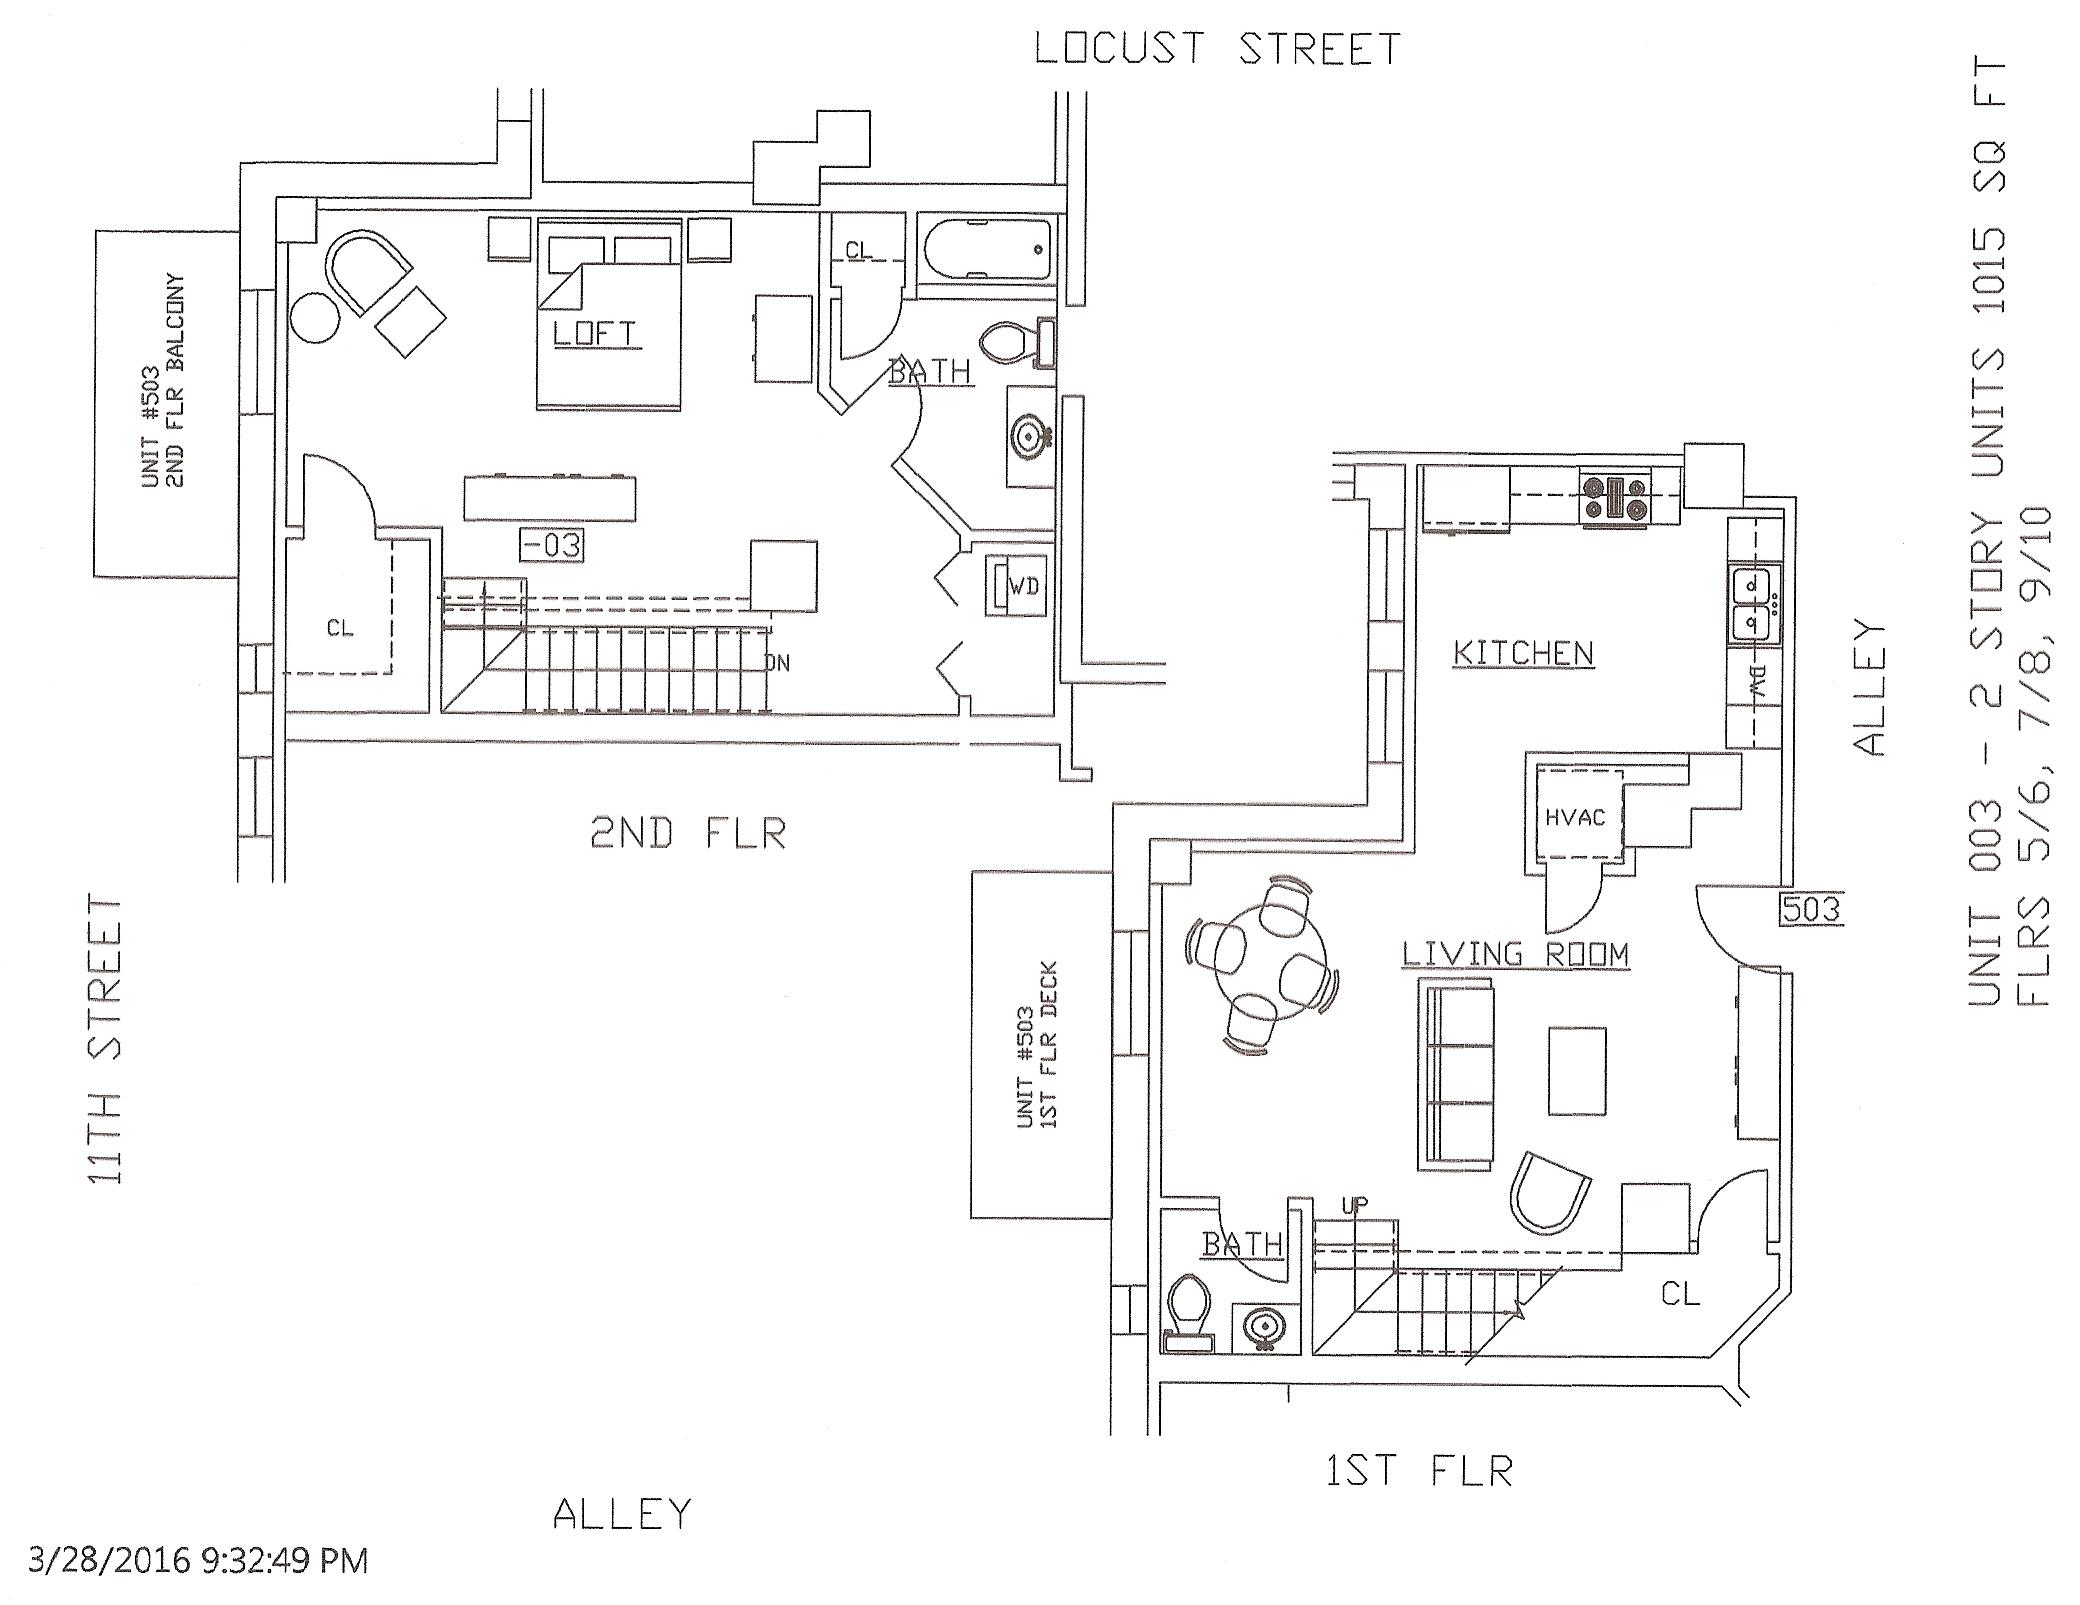 Unit 03, 1015 Square Feet